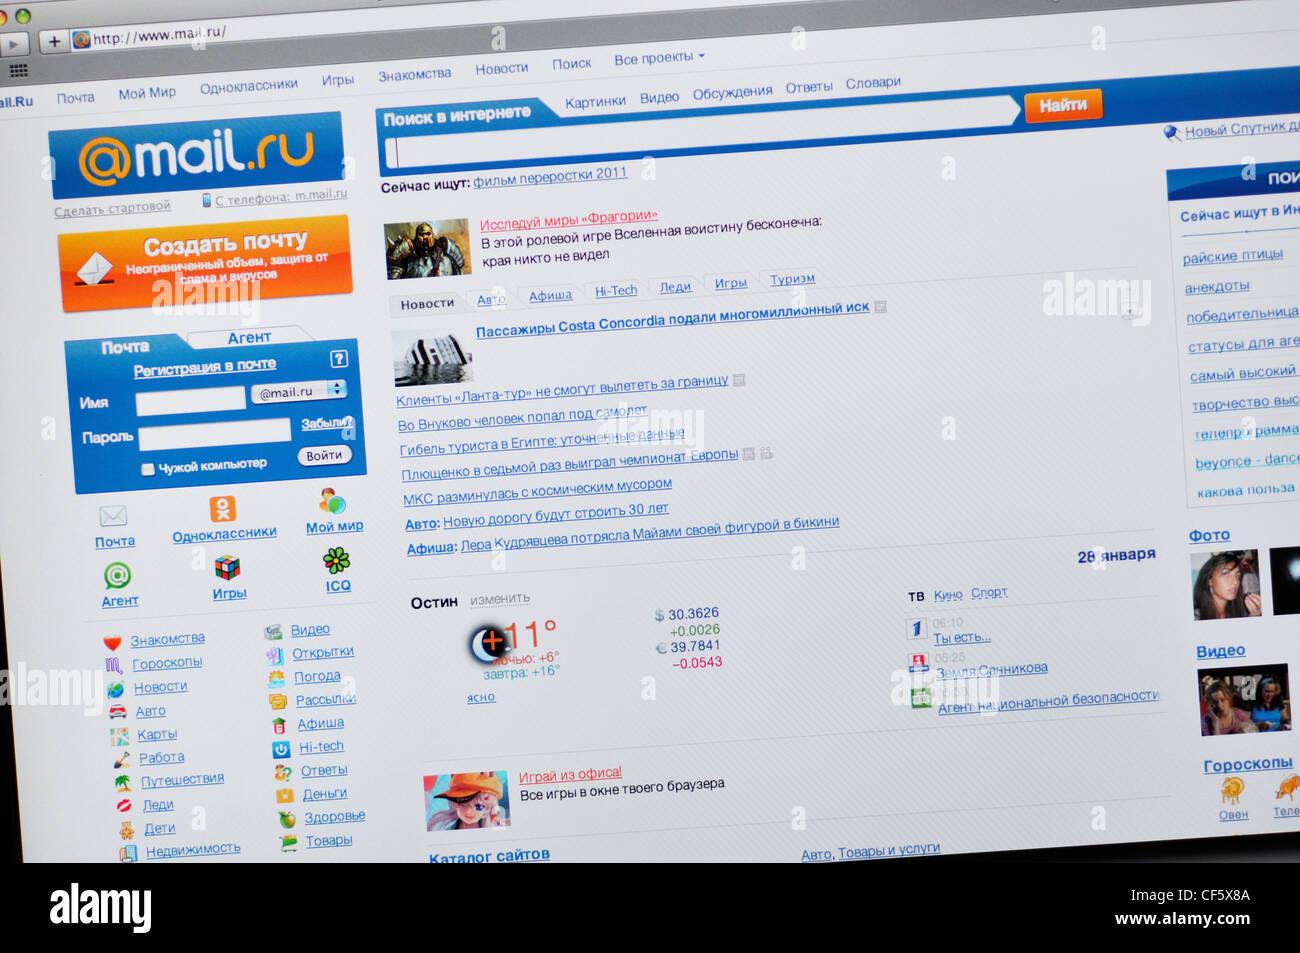 Mail.ru sito russo - email Immagini Stock